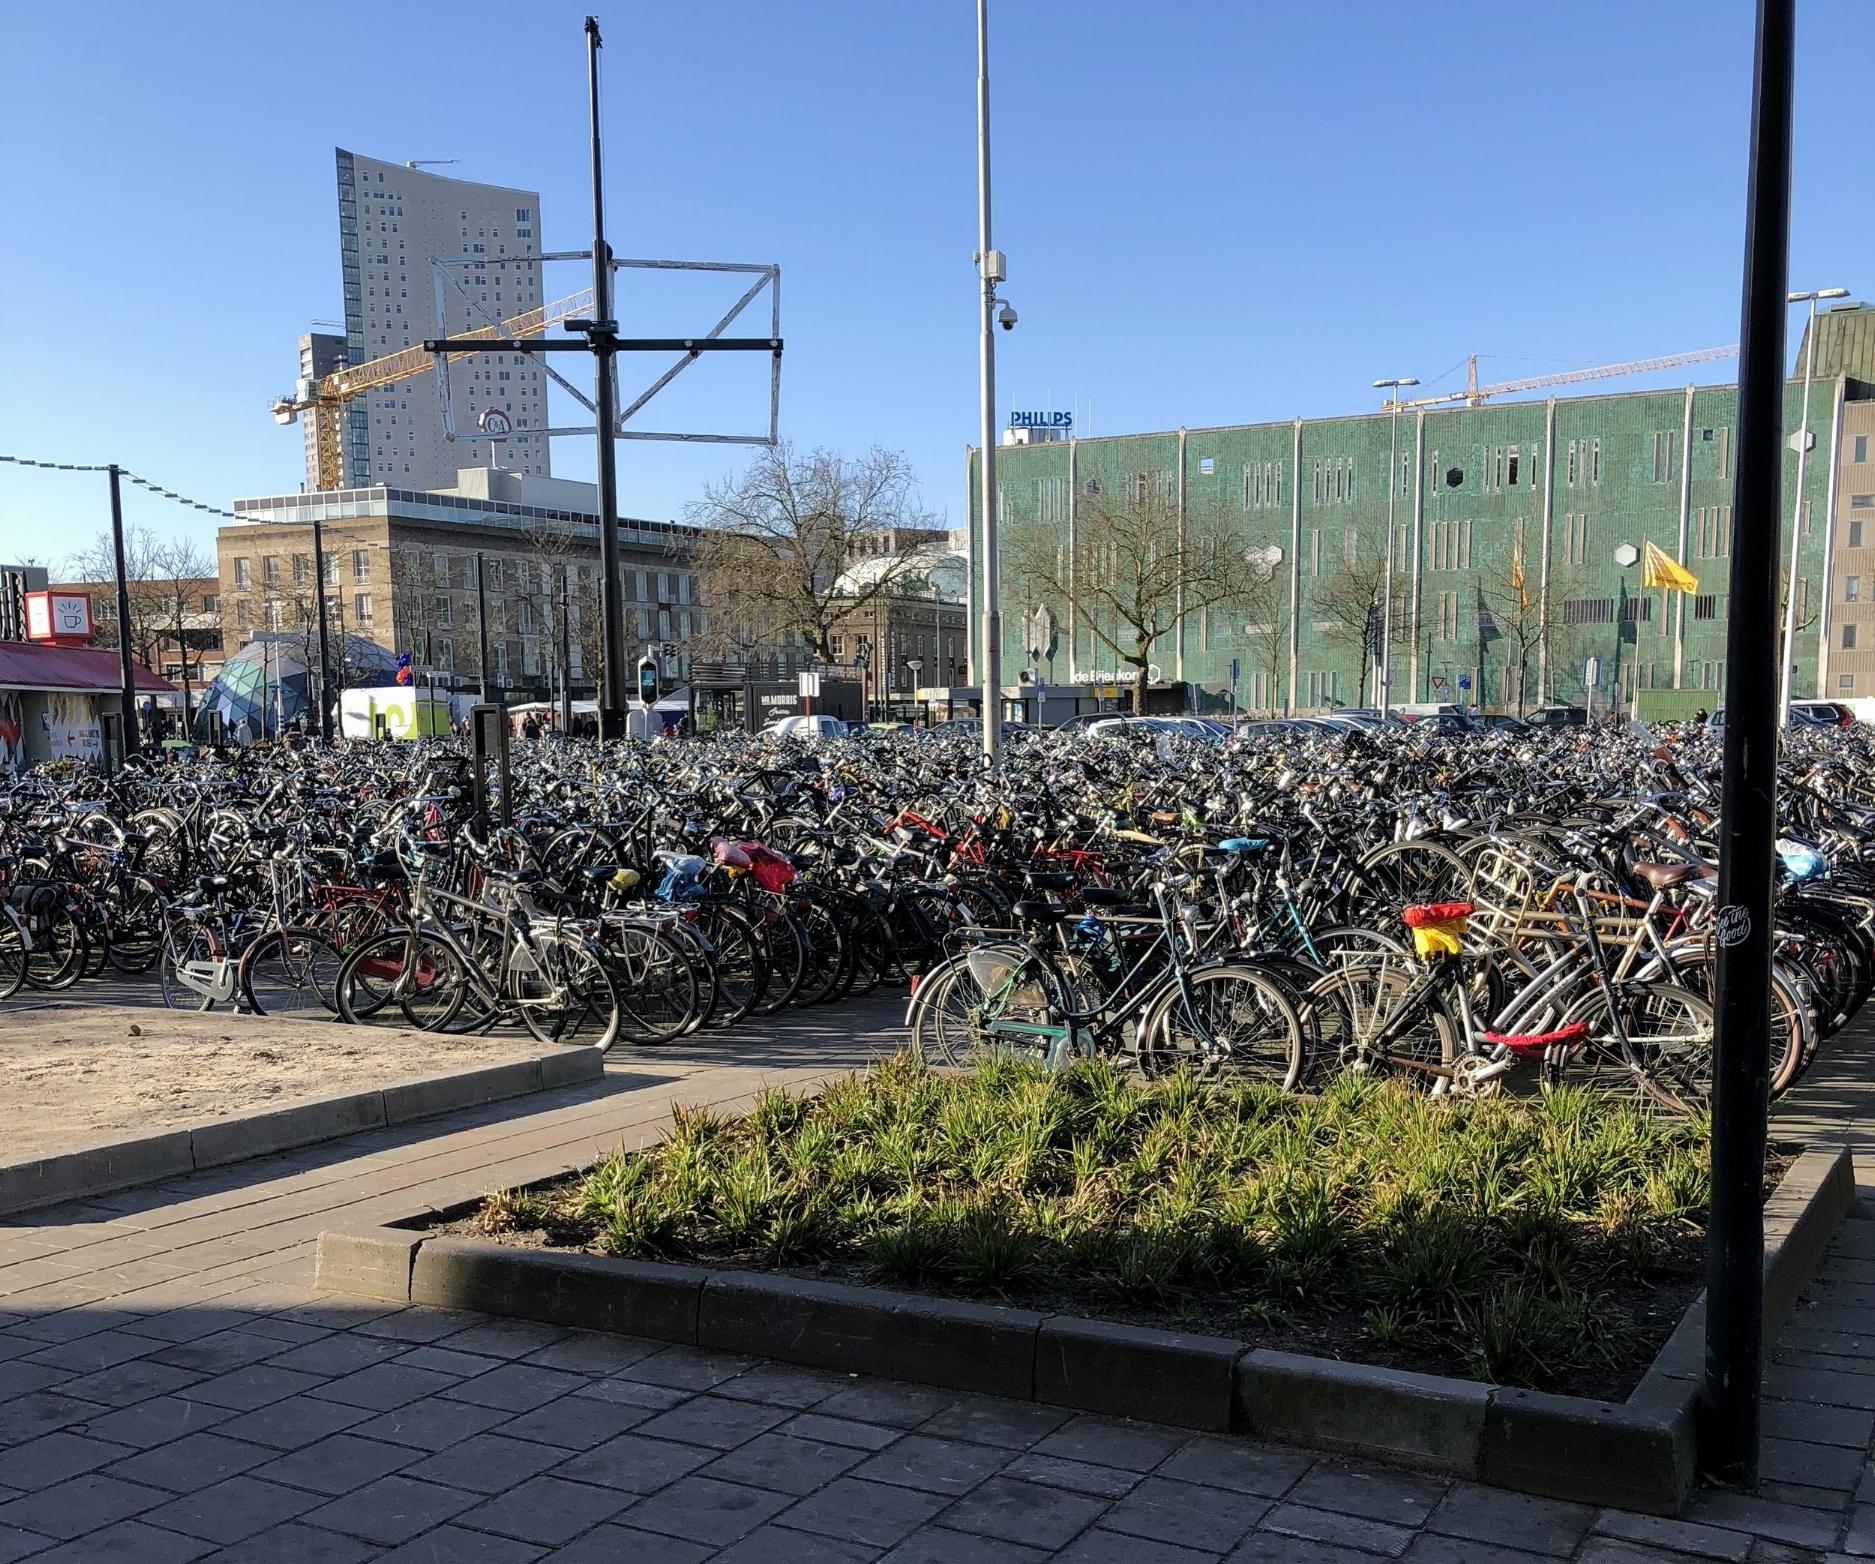 Eindhoven & The Netherlands are very bike friendly - photo by Travis Stewart